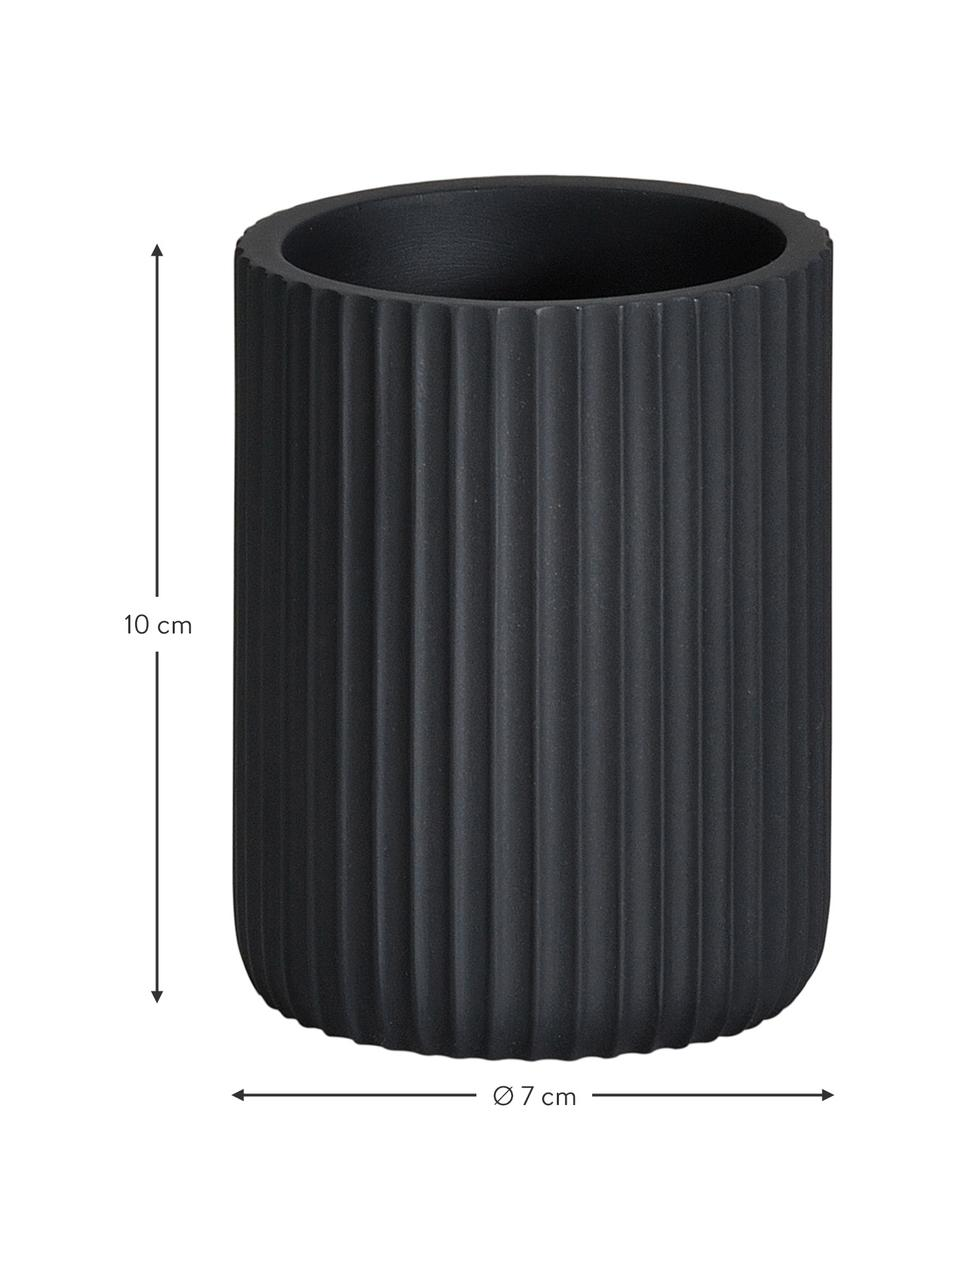 Porta spazzolini Blackheath, Poliresina, Nero, Ø 7 x Alt. 10 cm